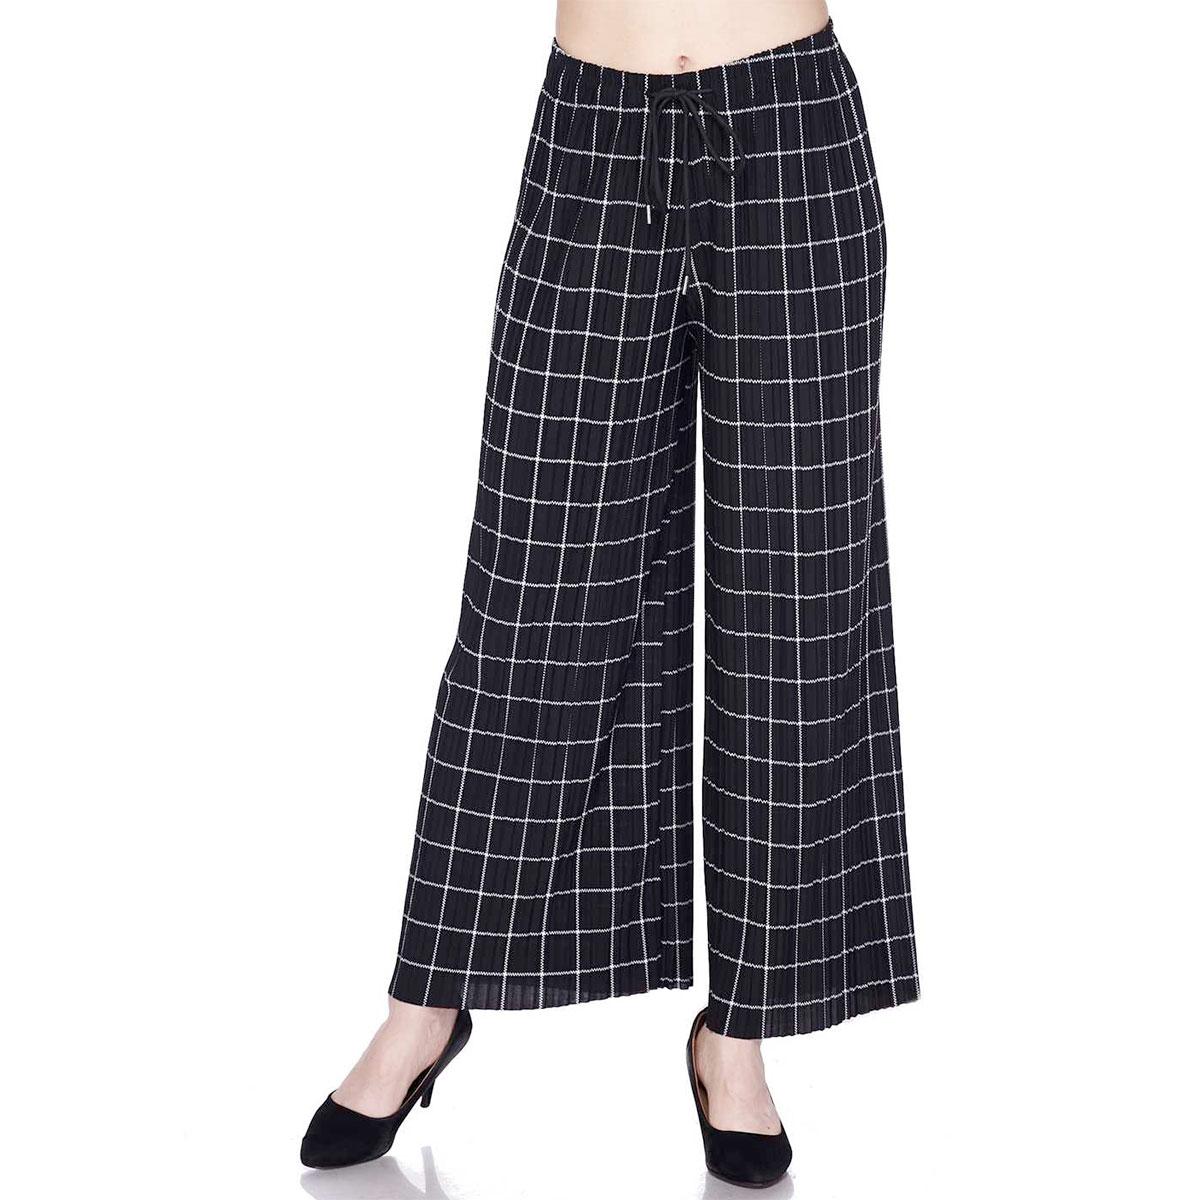 Wholesale Magic Crush Georgette - Three Quarter Sleeve* Ankle Length - #16 Grid Print Black-White w/ Drawstring - One Size Fits All